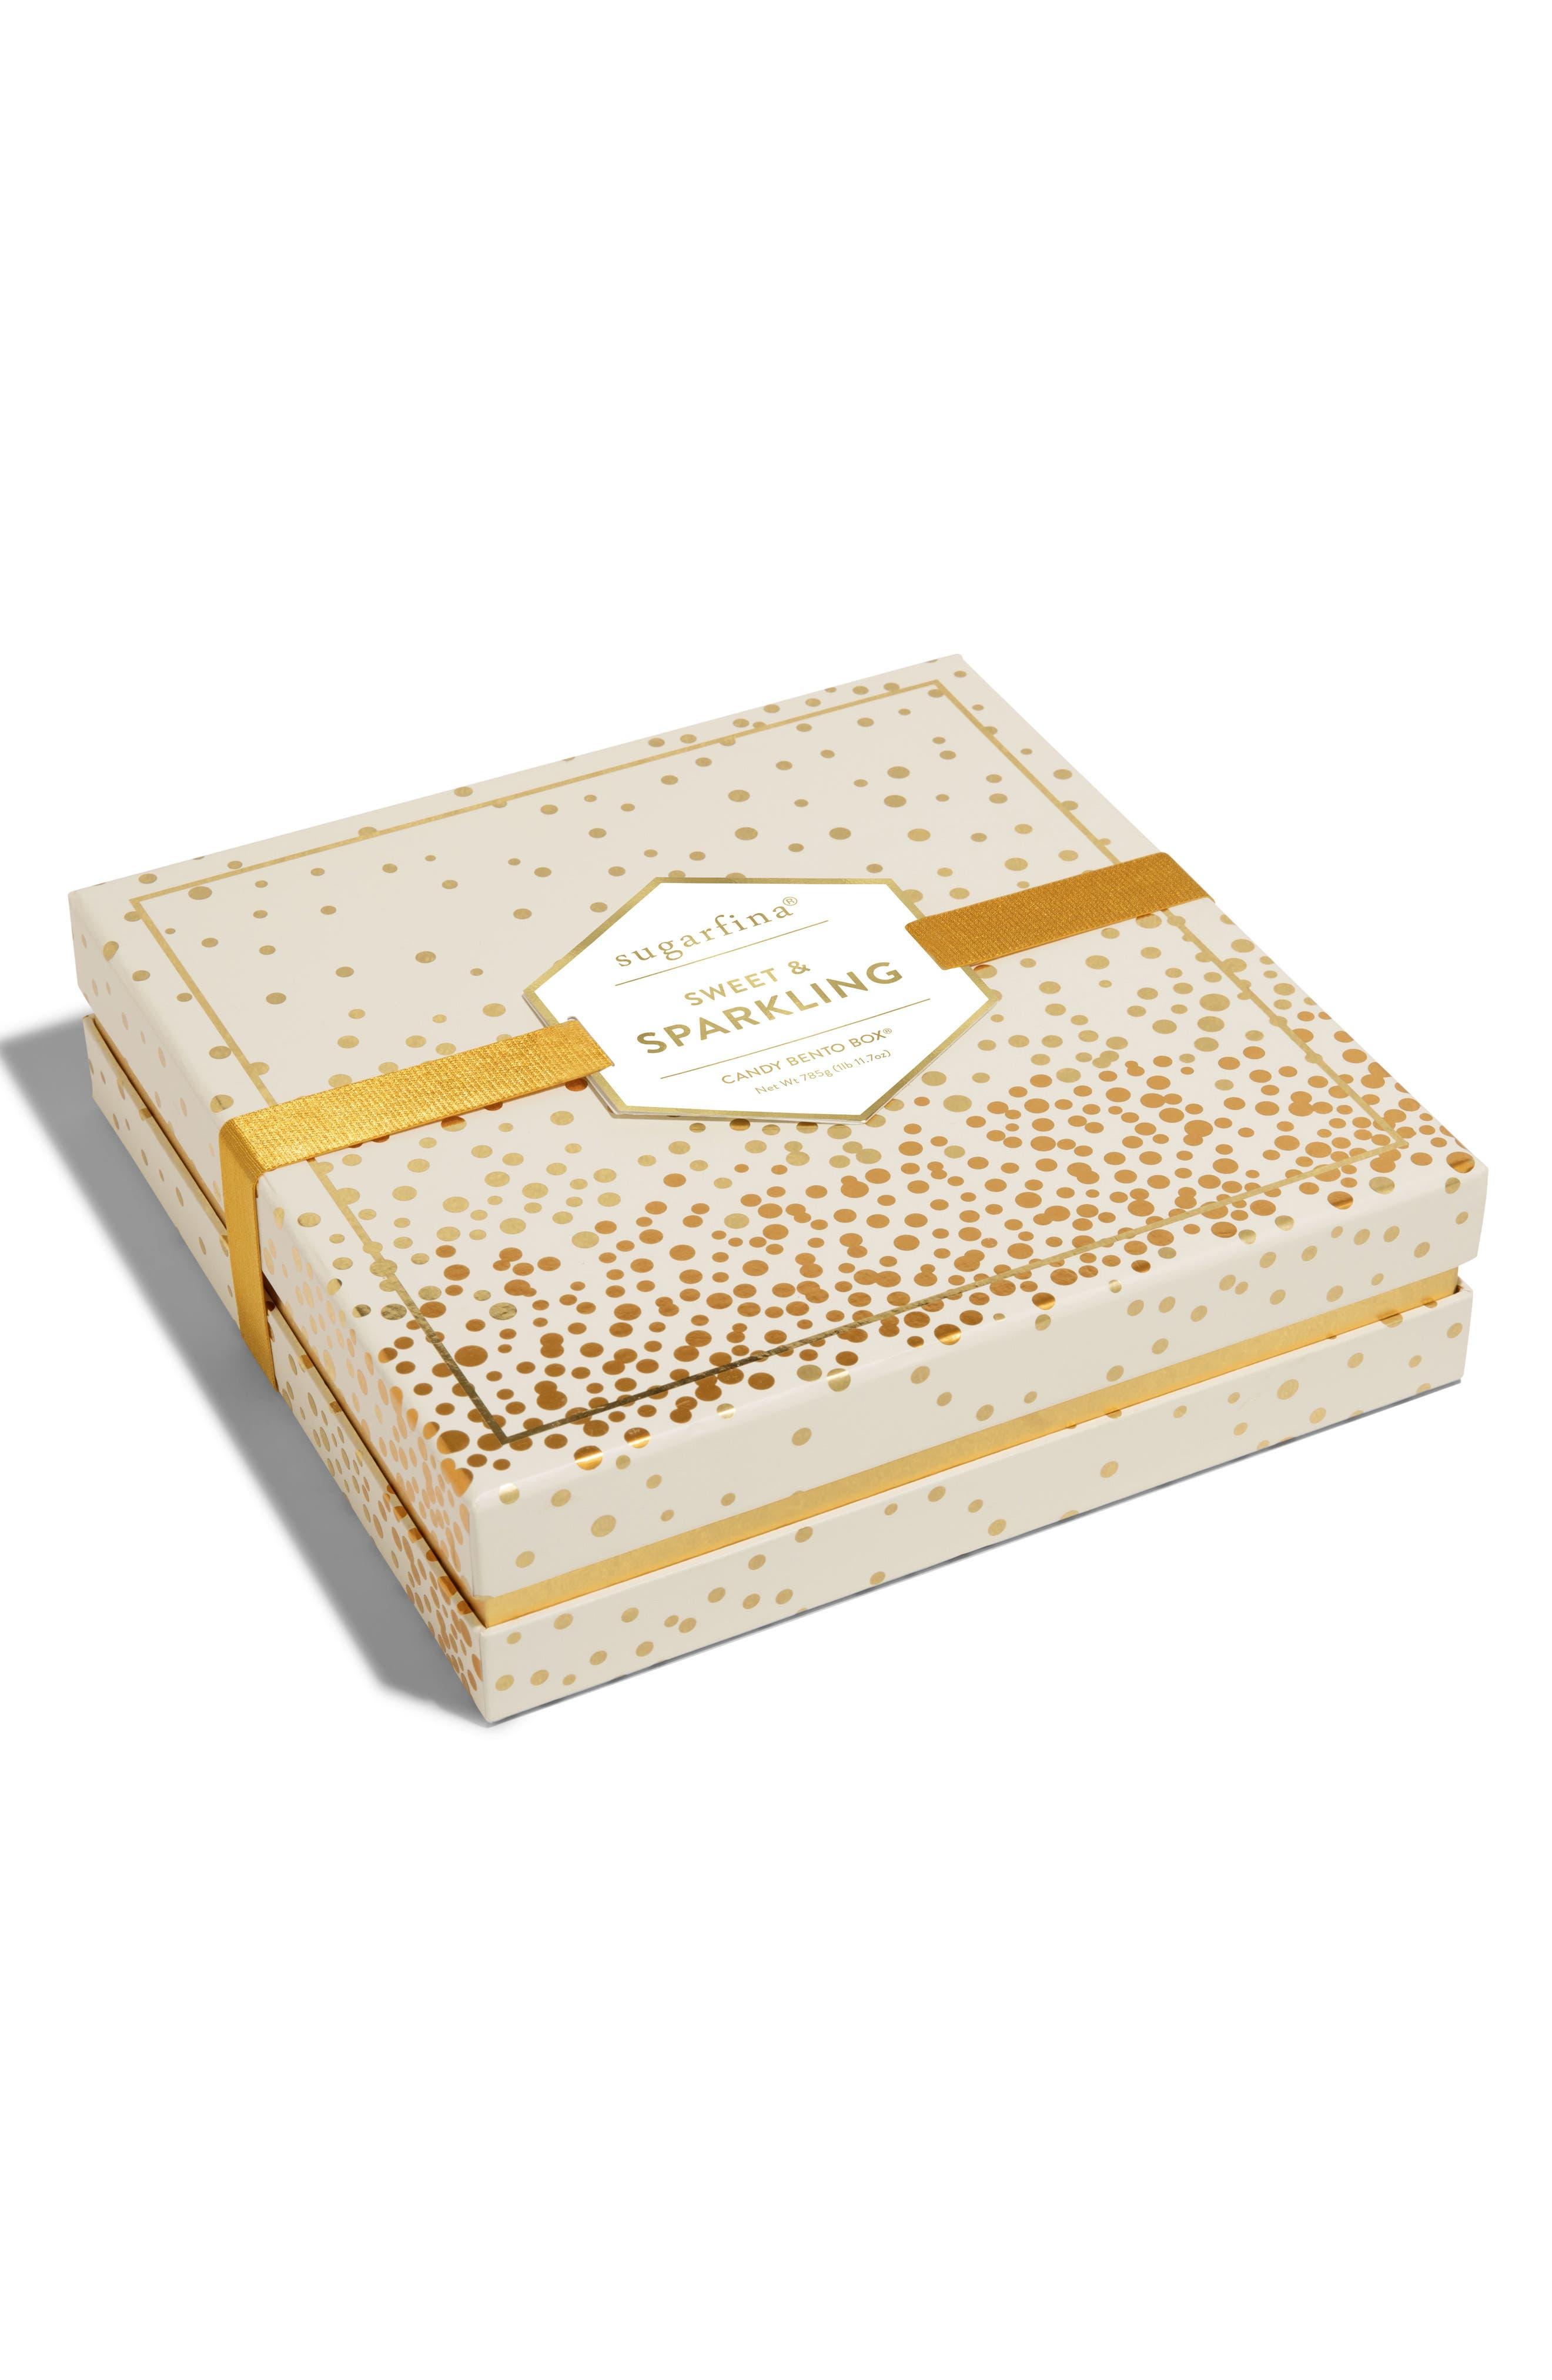 Alternate Image 2  - sugarfina Sparkling 8-Piece Candy Bento Box